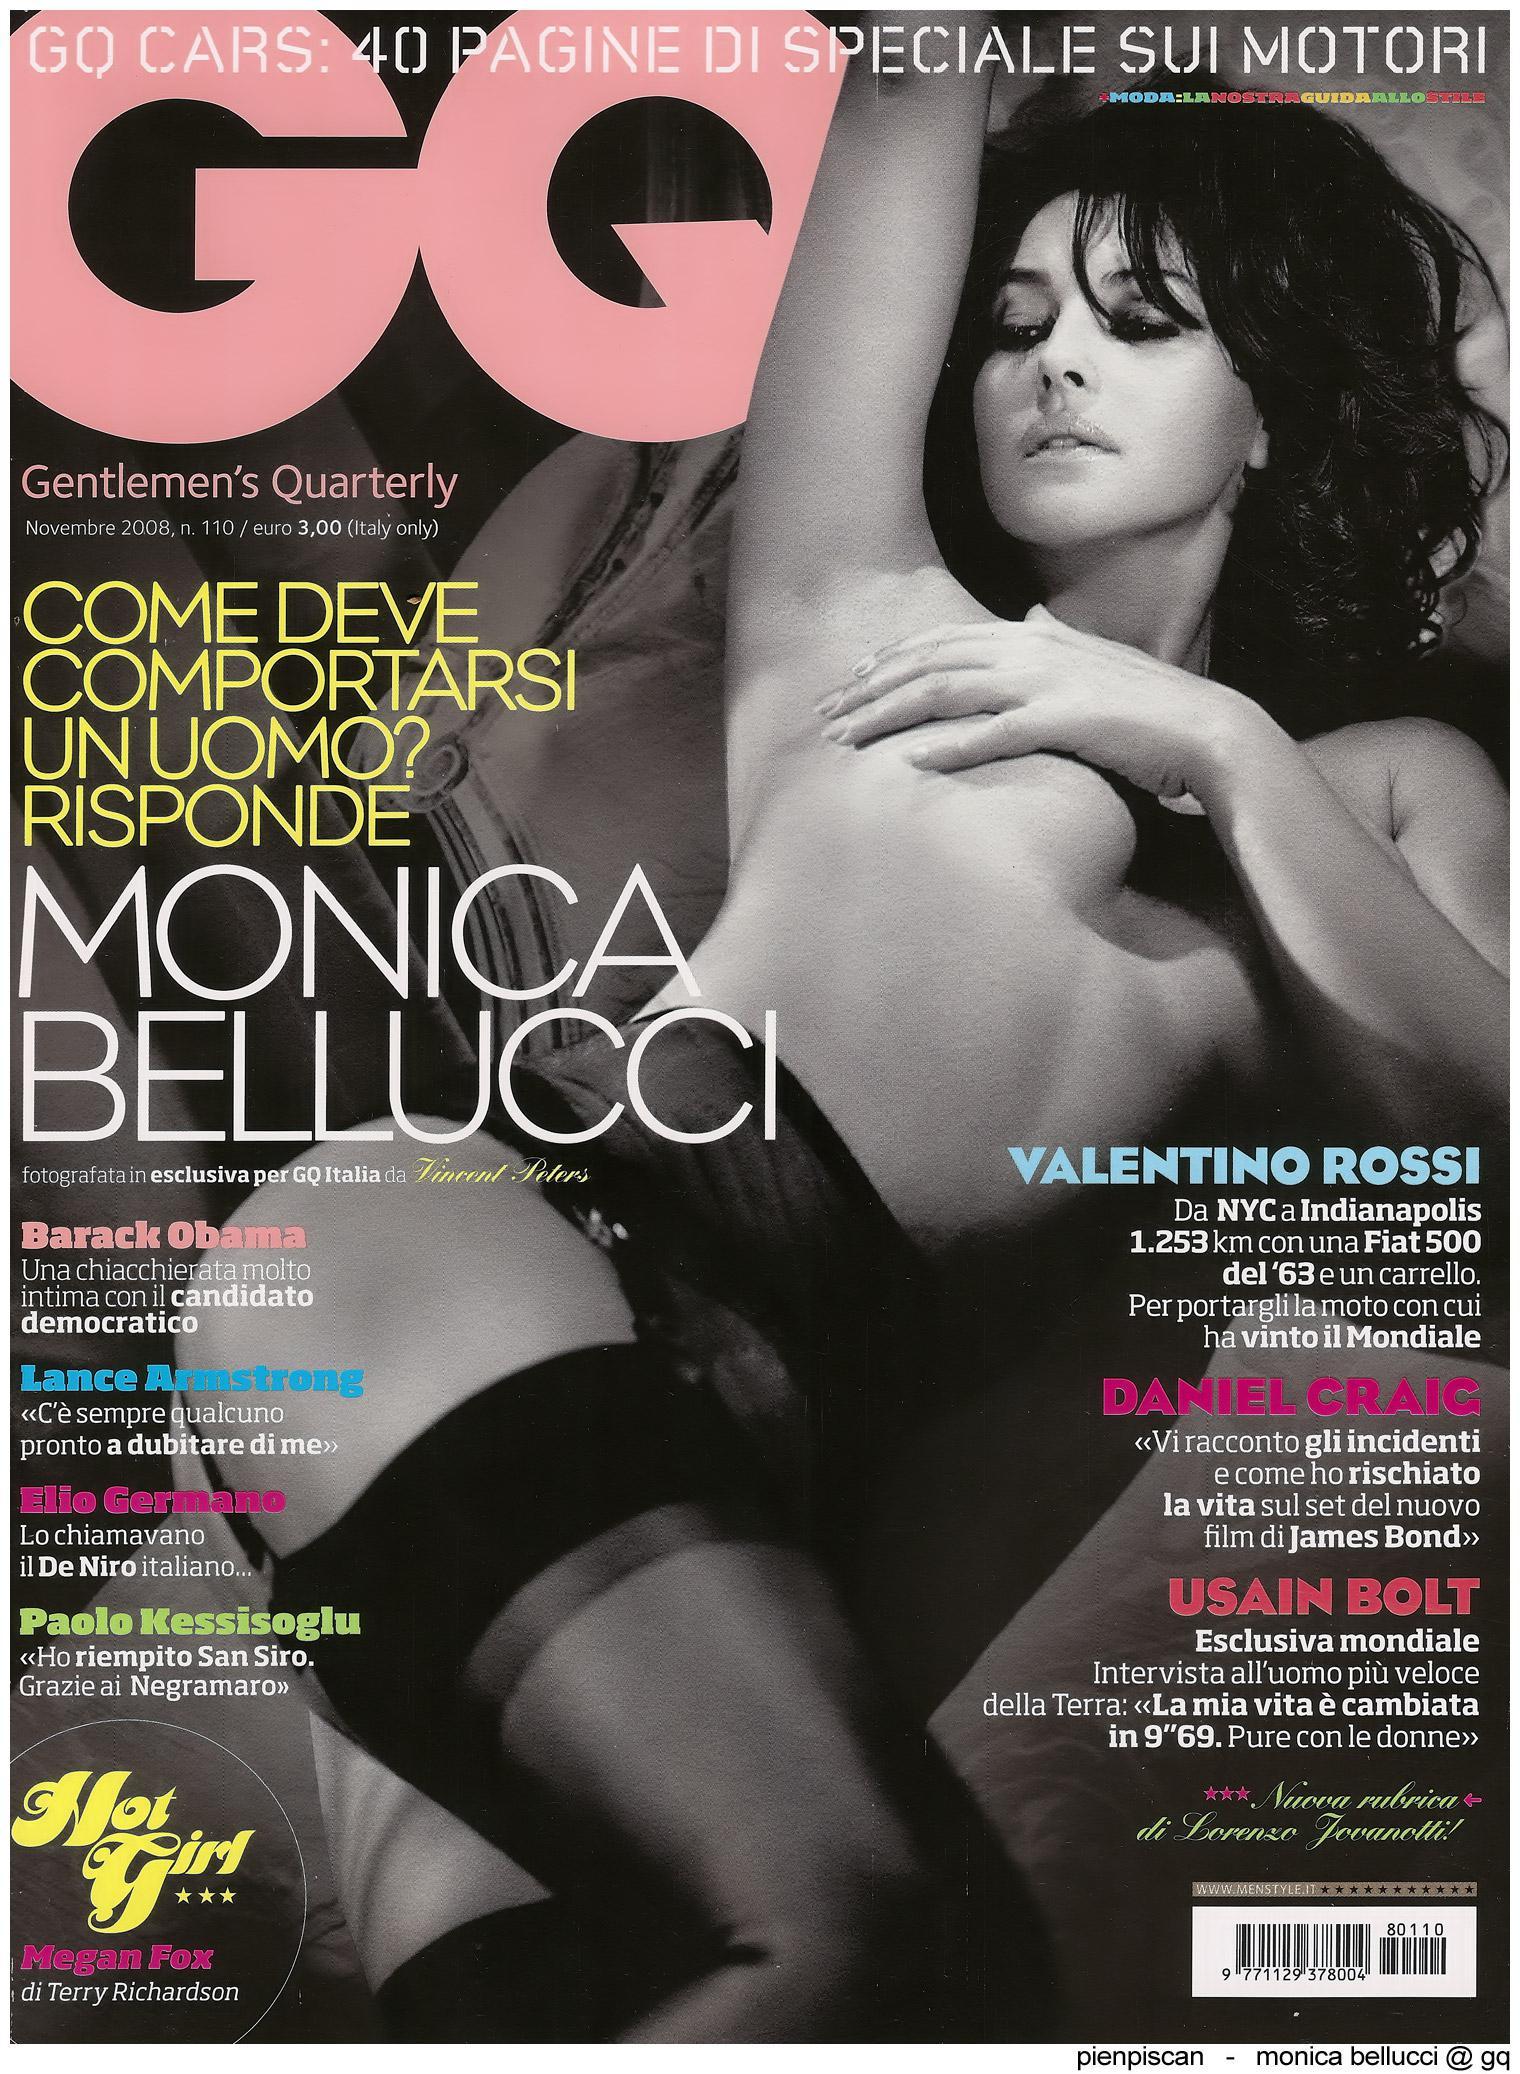 Monica Bellucci dura